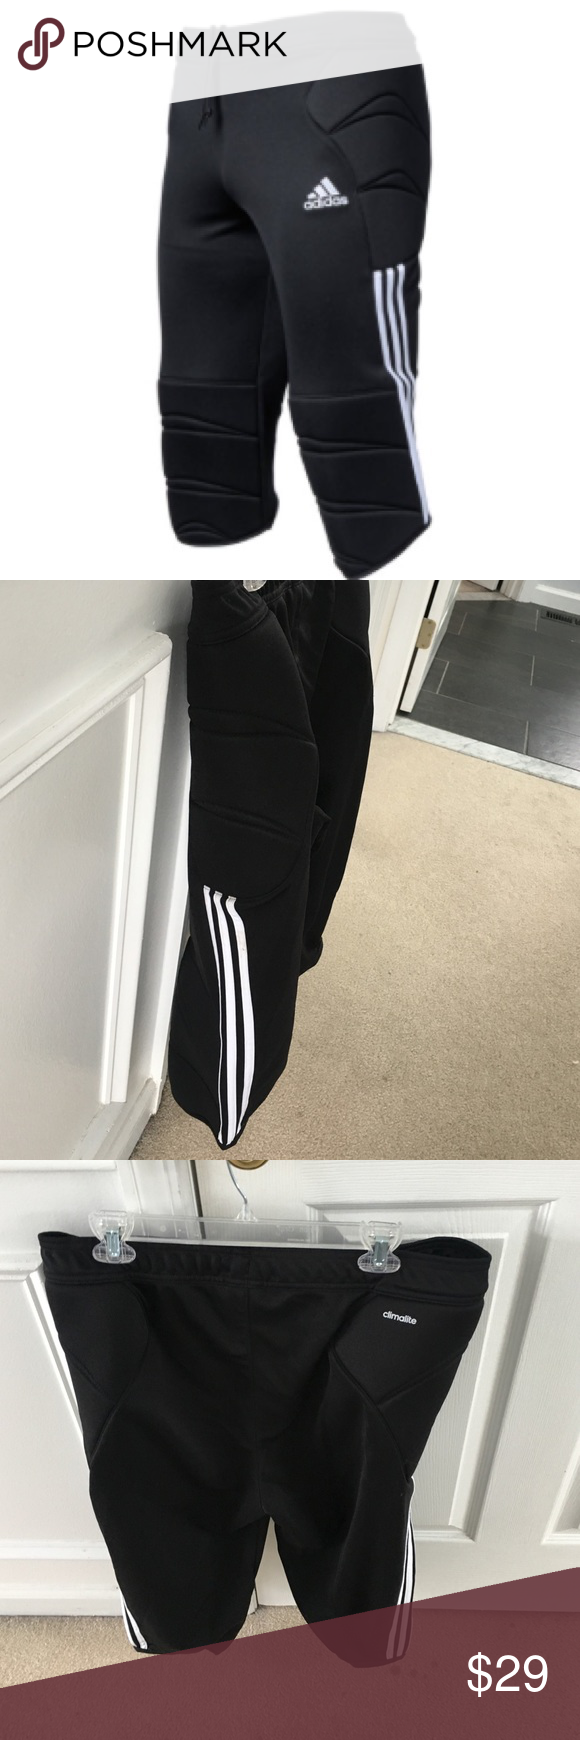 Adidas men's tierro 13 goalkeeper 34 pants Black Adidas